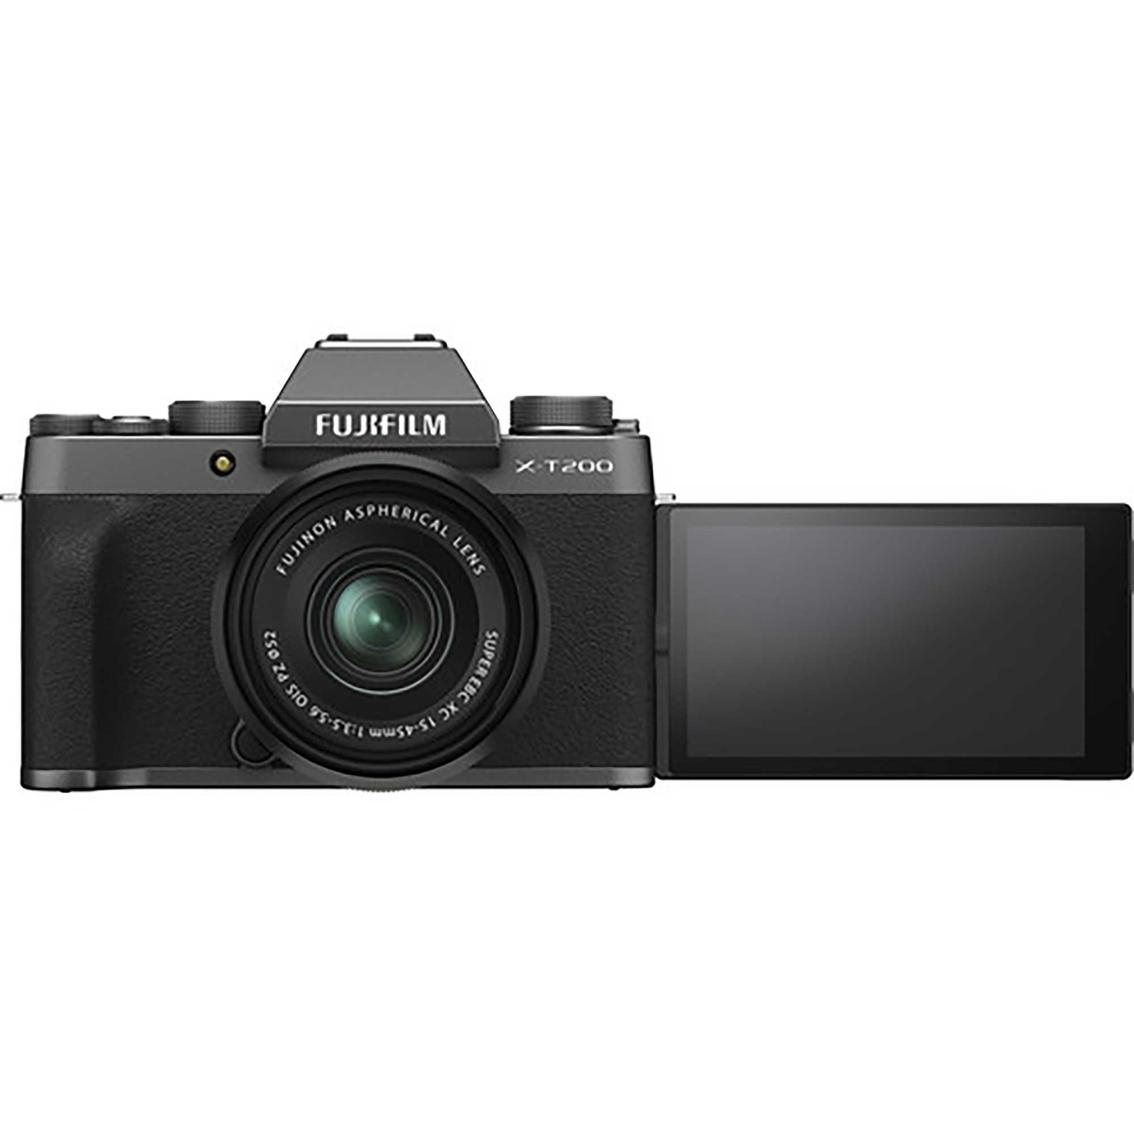 Fujifilm X T20 Military Appreciation Bundle   Dslr Cameras ...